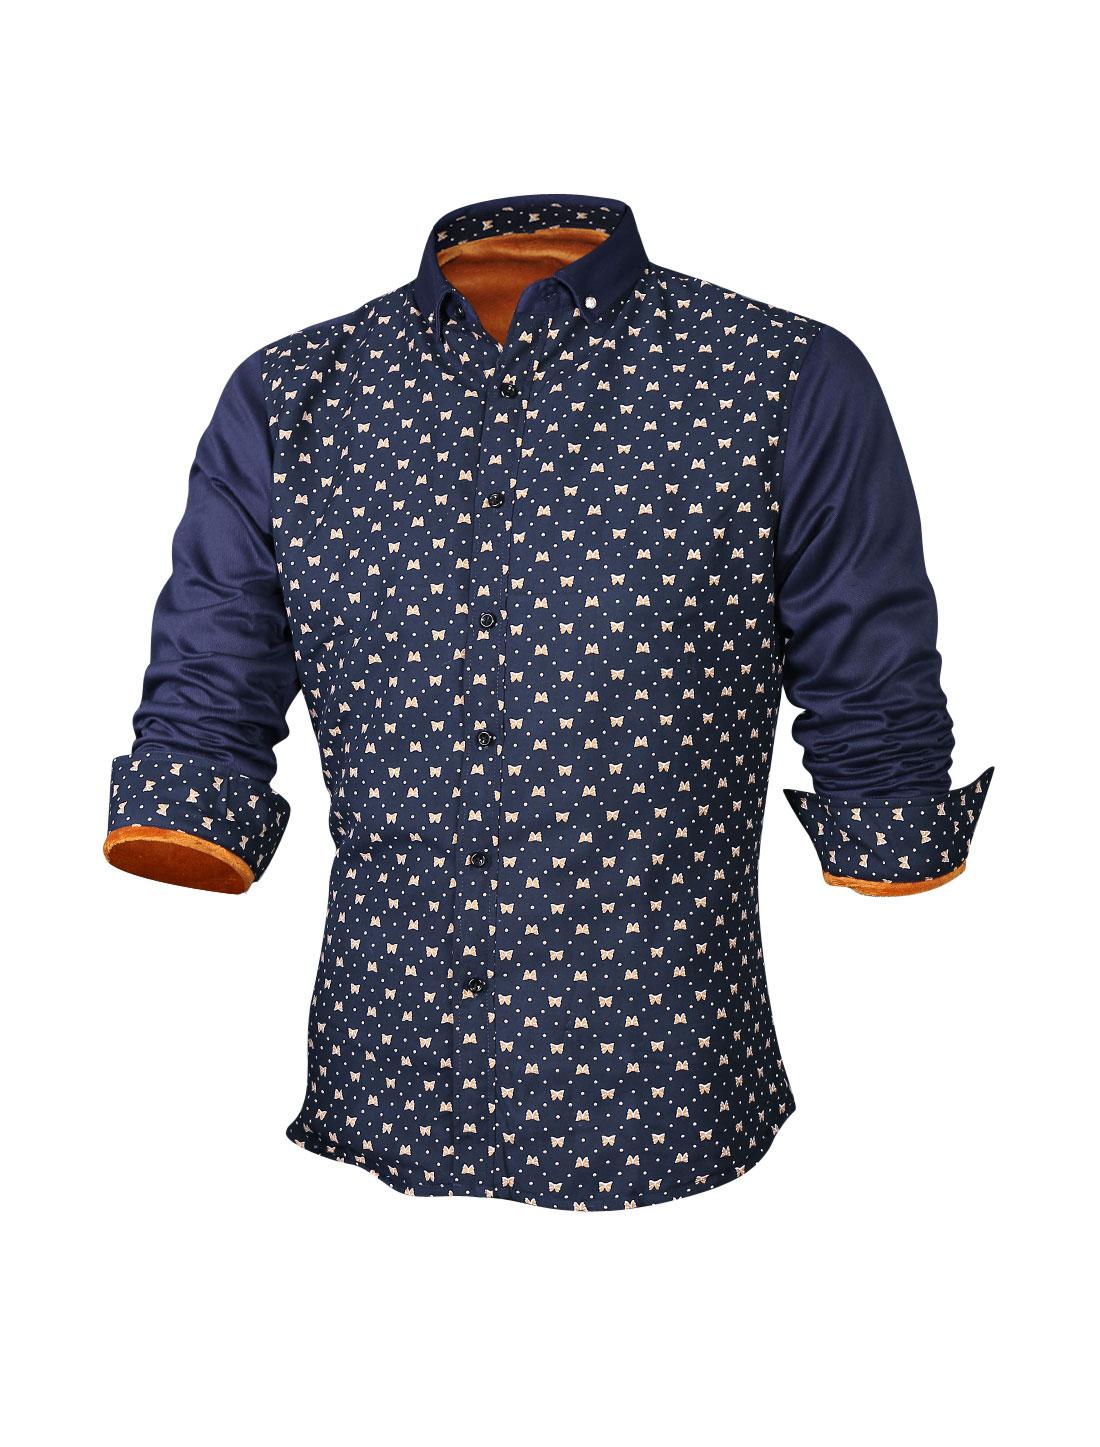 Men Bowknot Dots Pattern Soft Lining Heavy Casual Shirt Navy Blue M